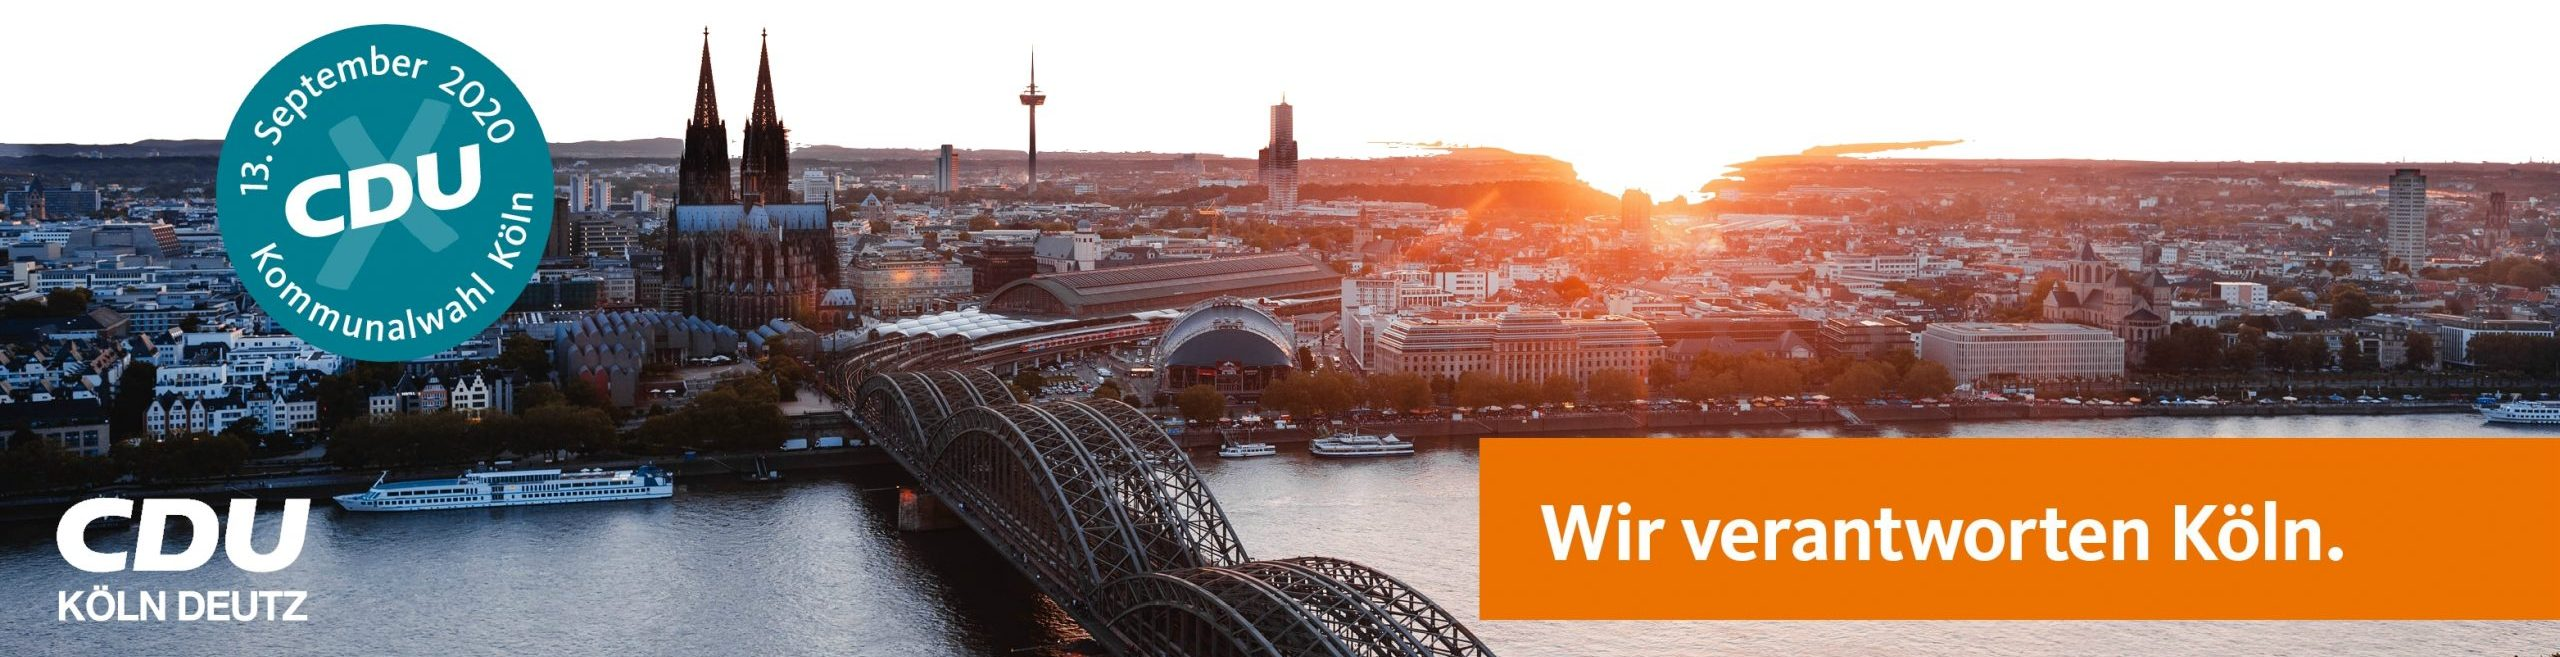 CDU Deutz | DEUTZ inform